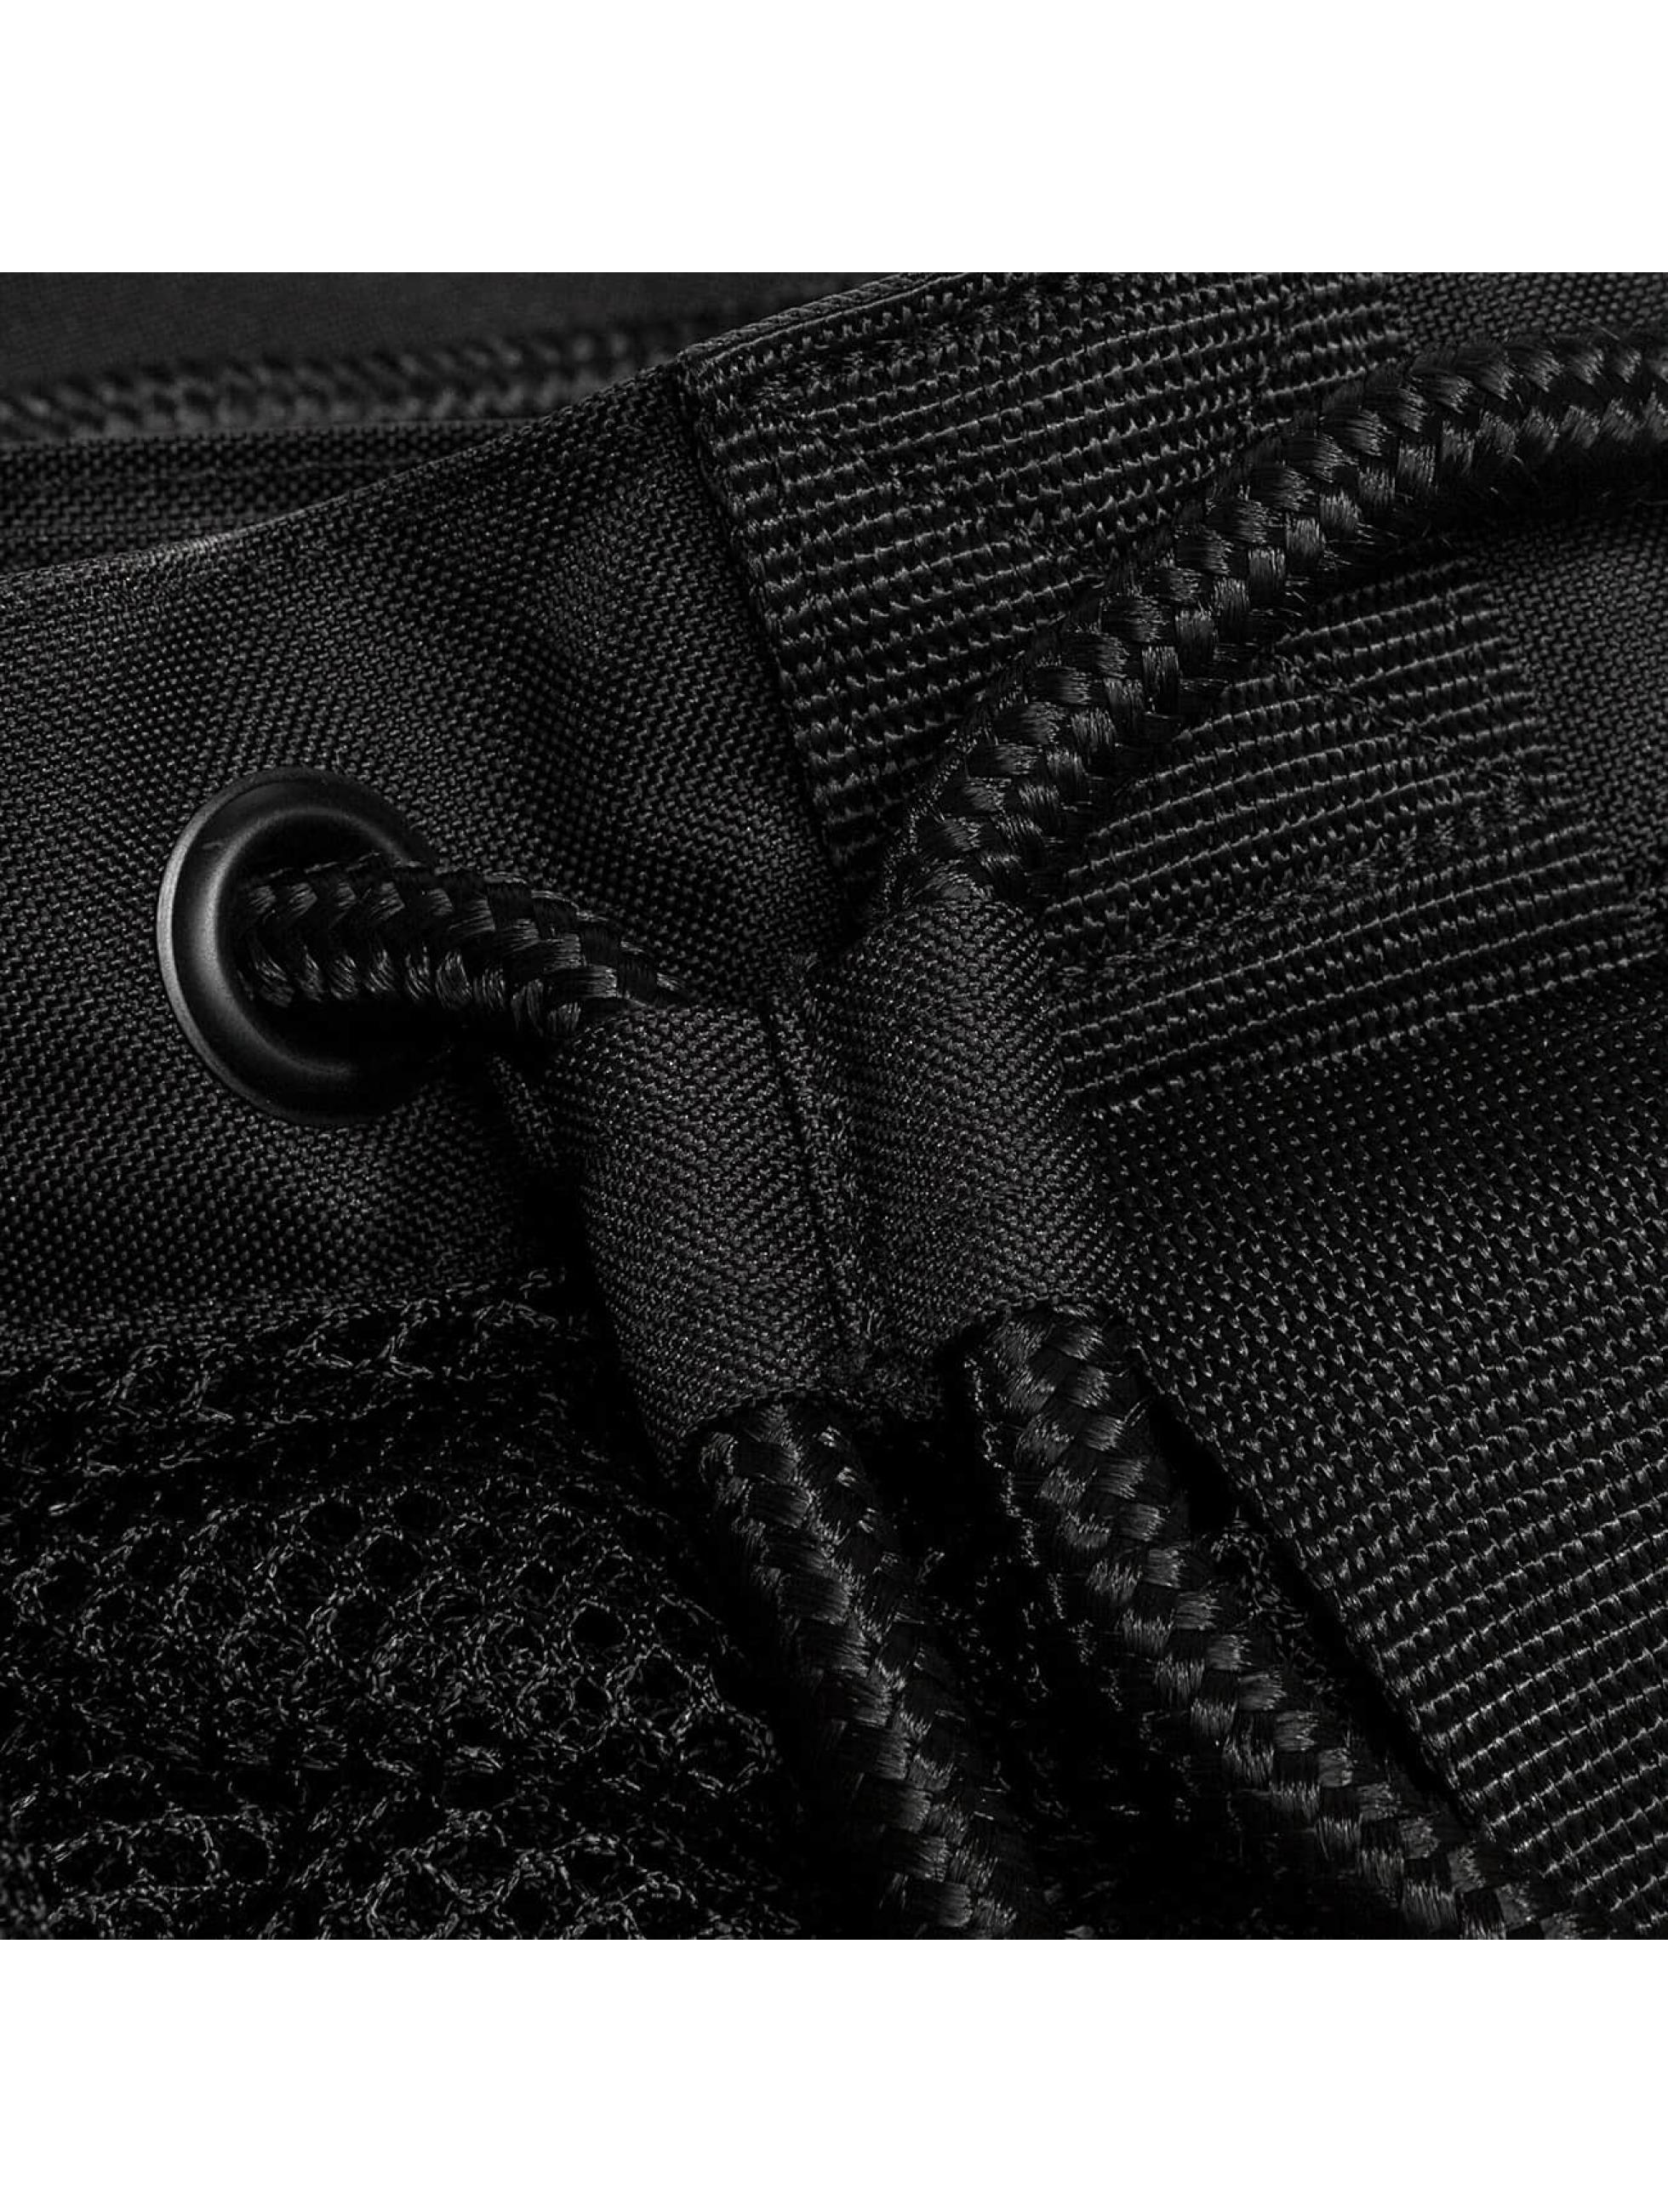 adidas Other Soccer Ball Net black